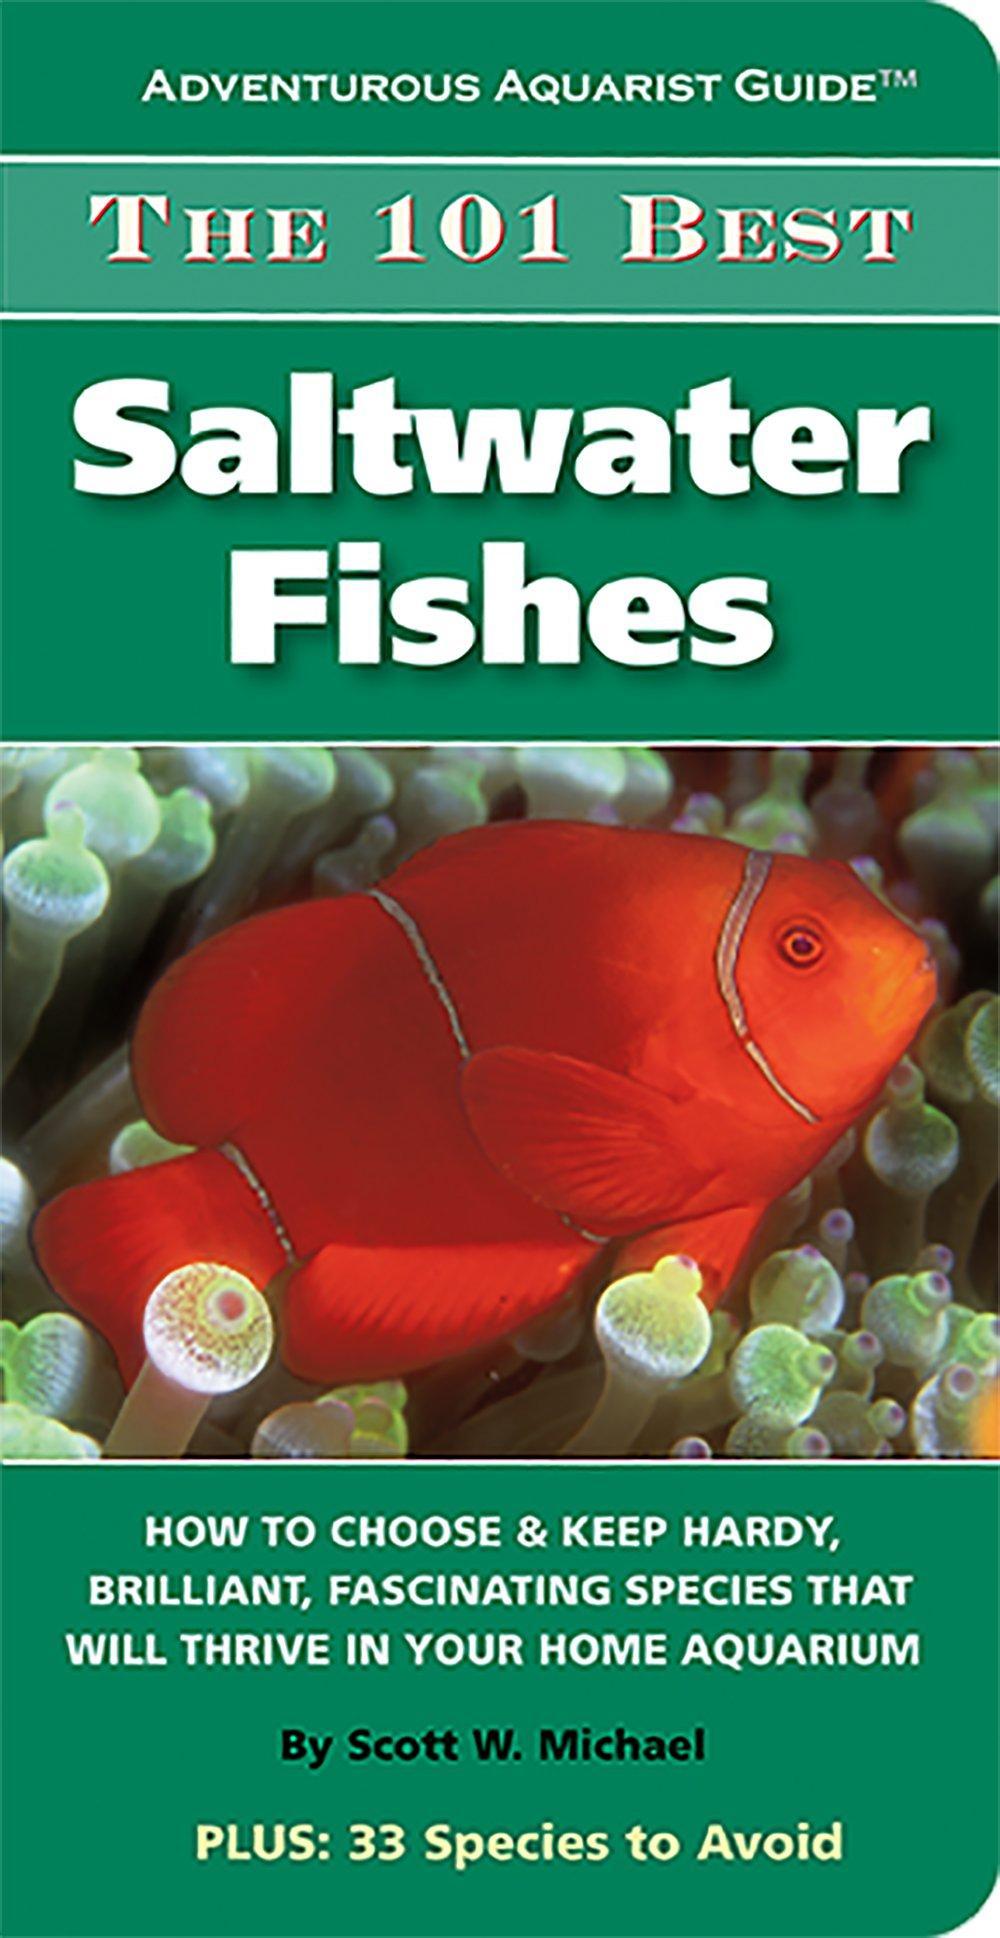 The 101 Best Saltwater Fishes (Adventurous Aquarist Guide)